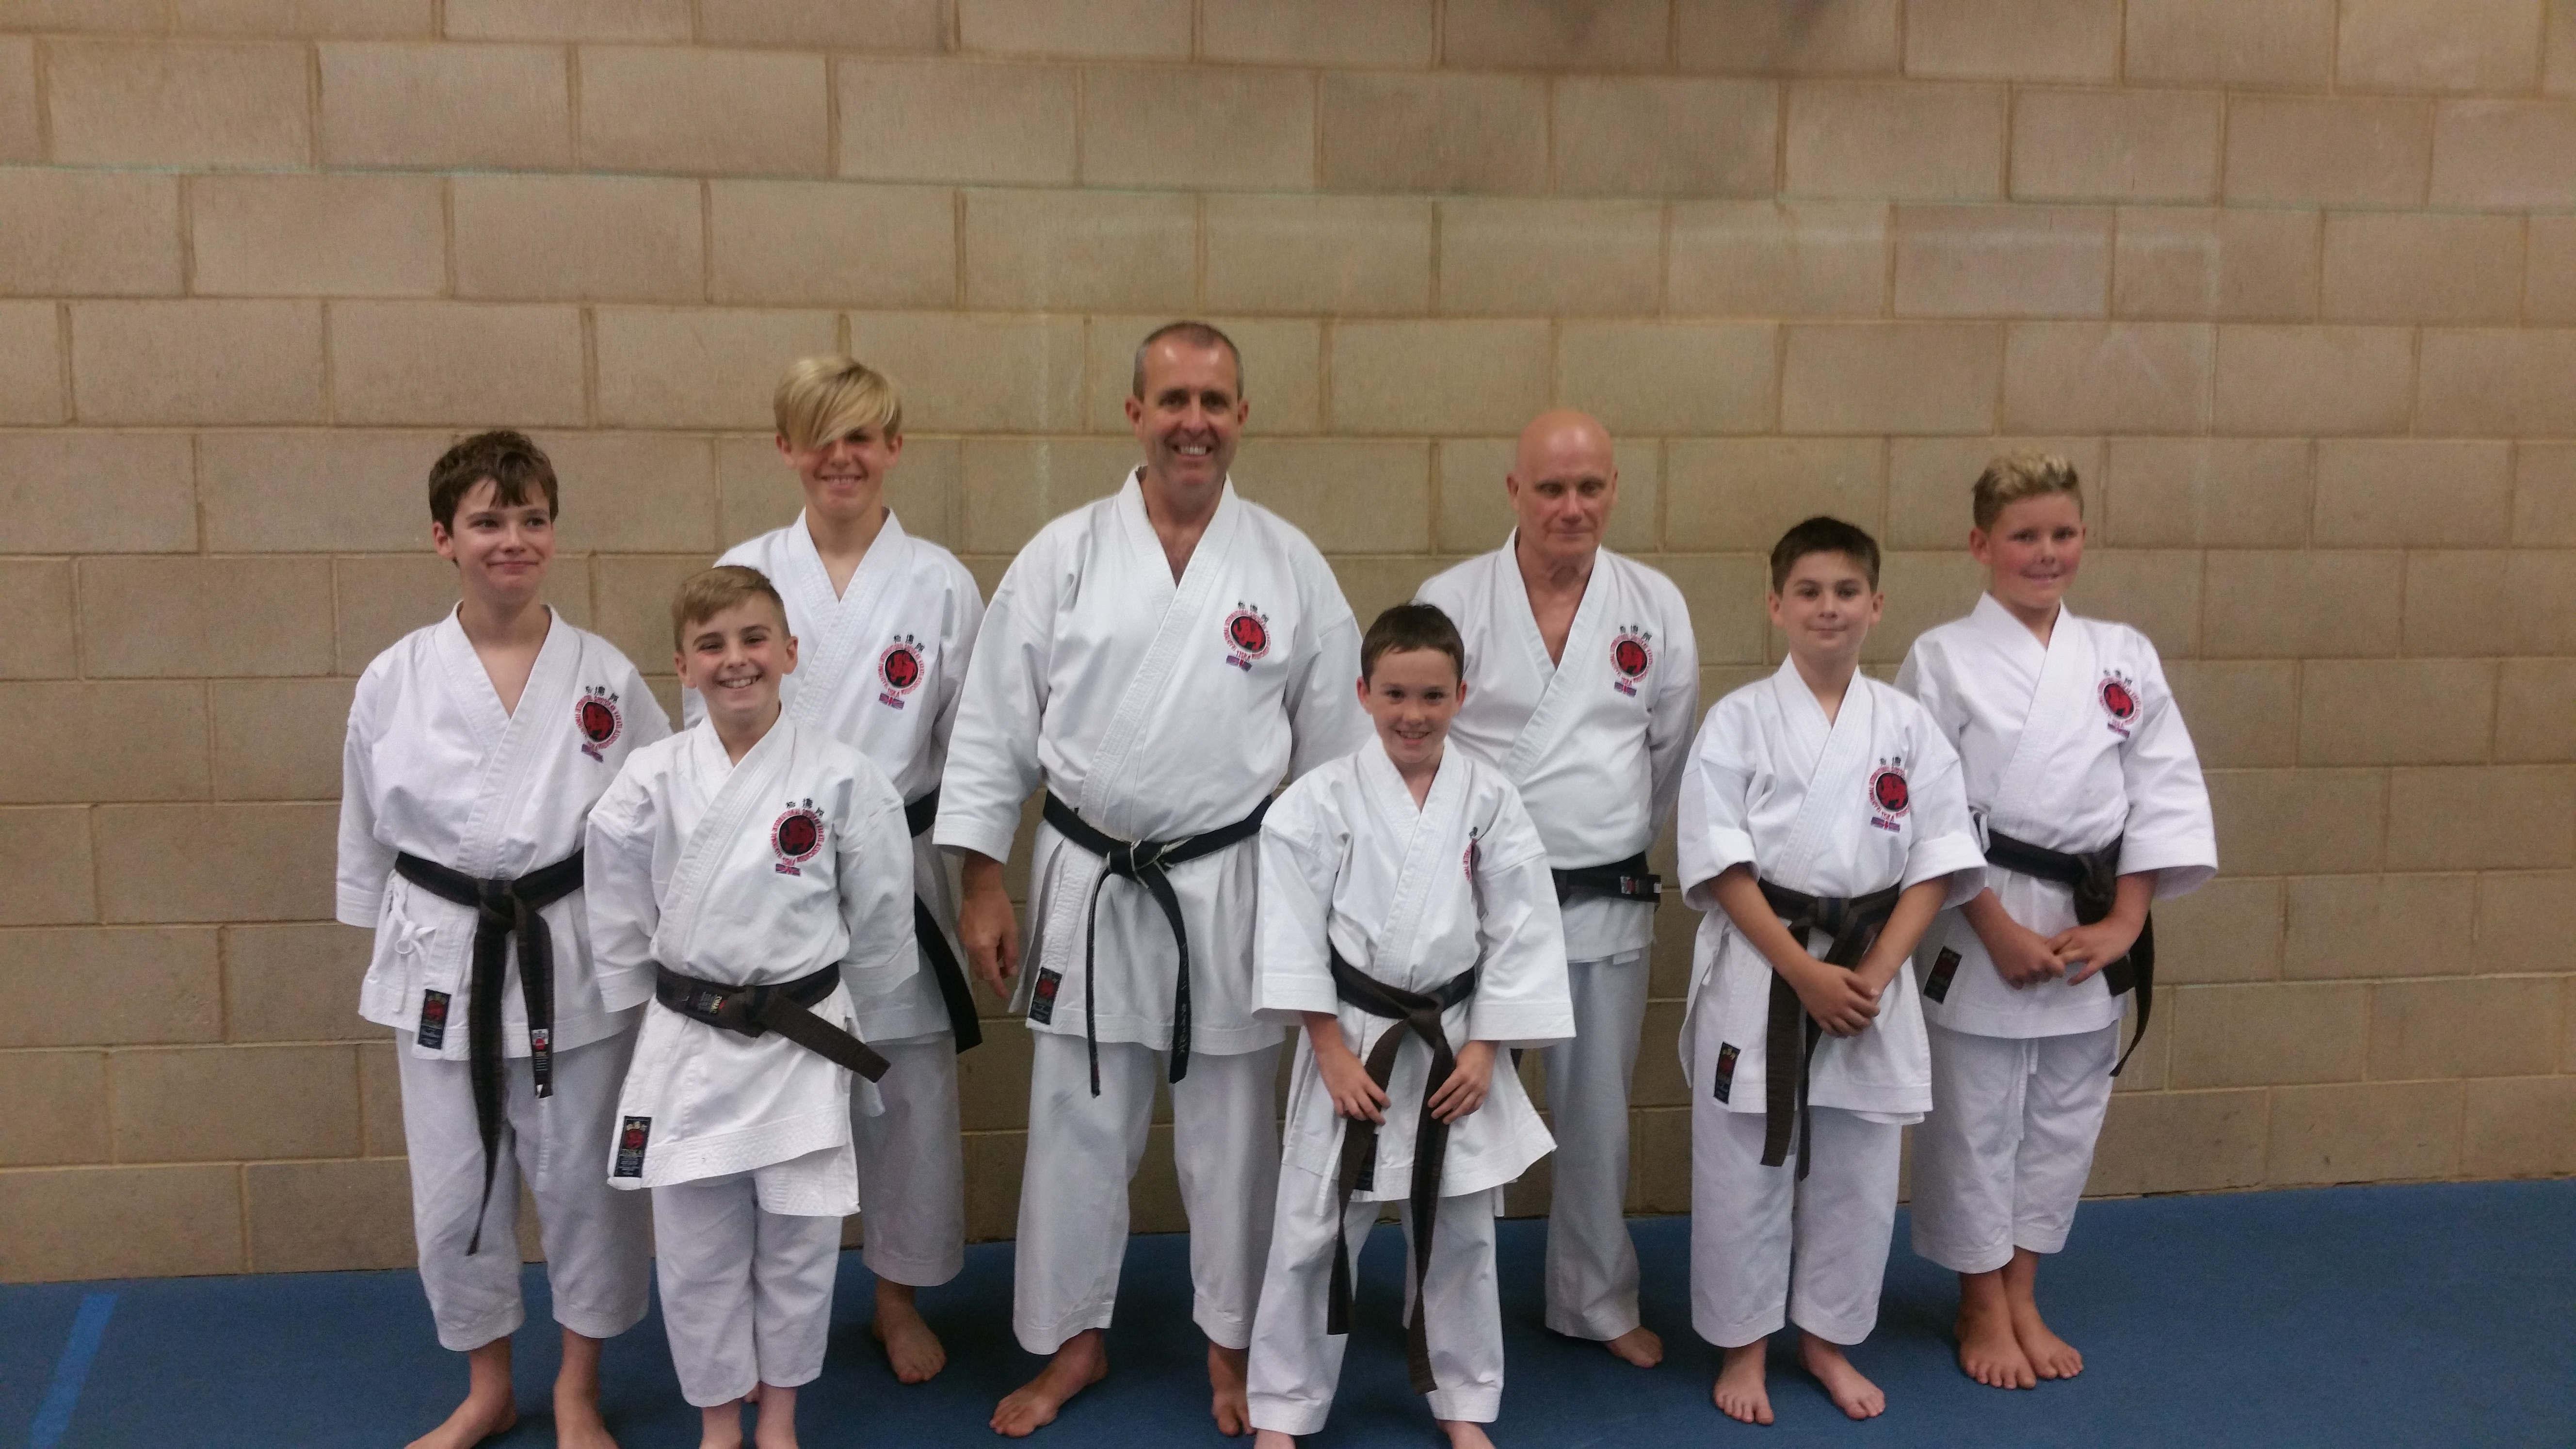 karate-staveley-karate_153057a